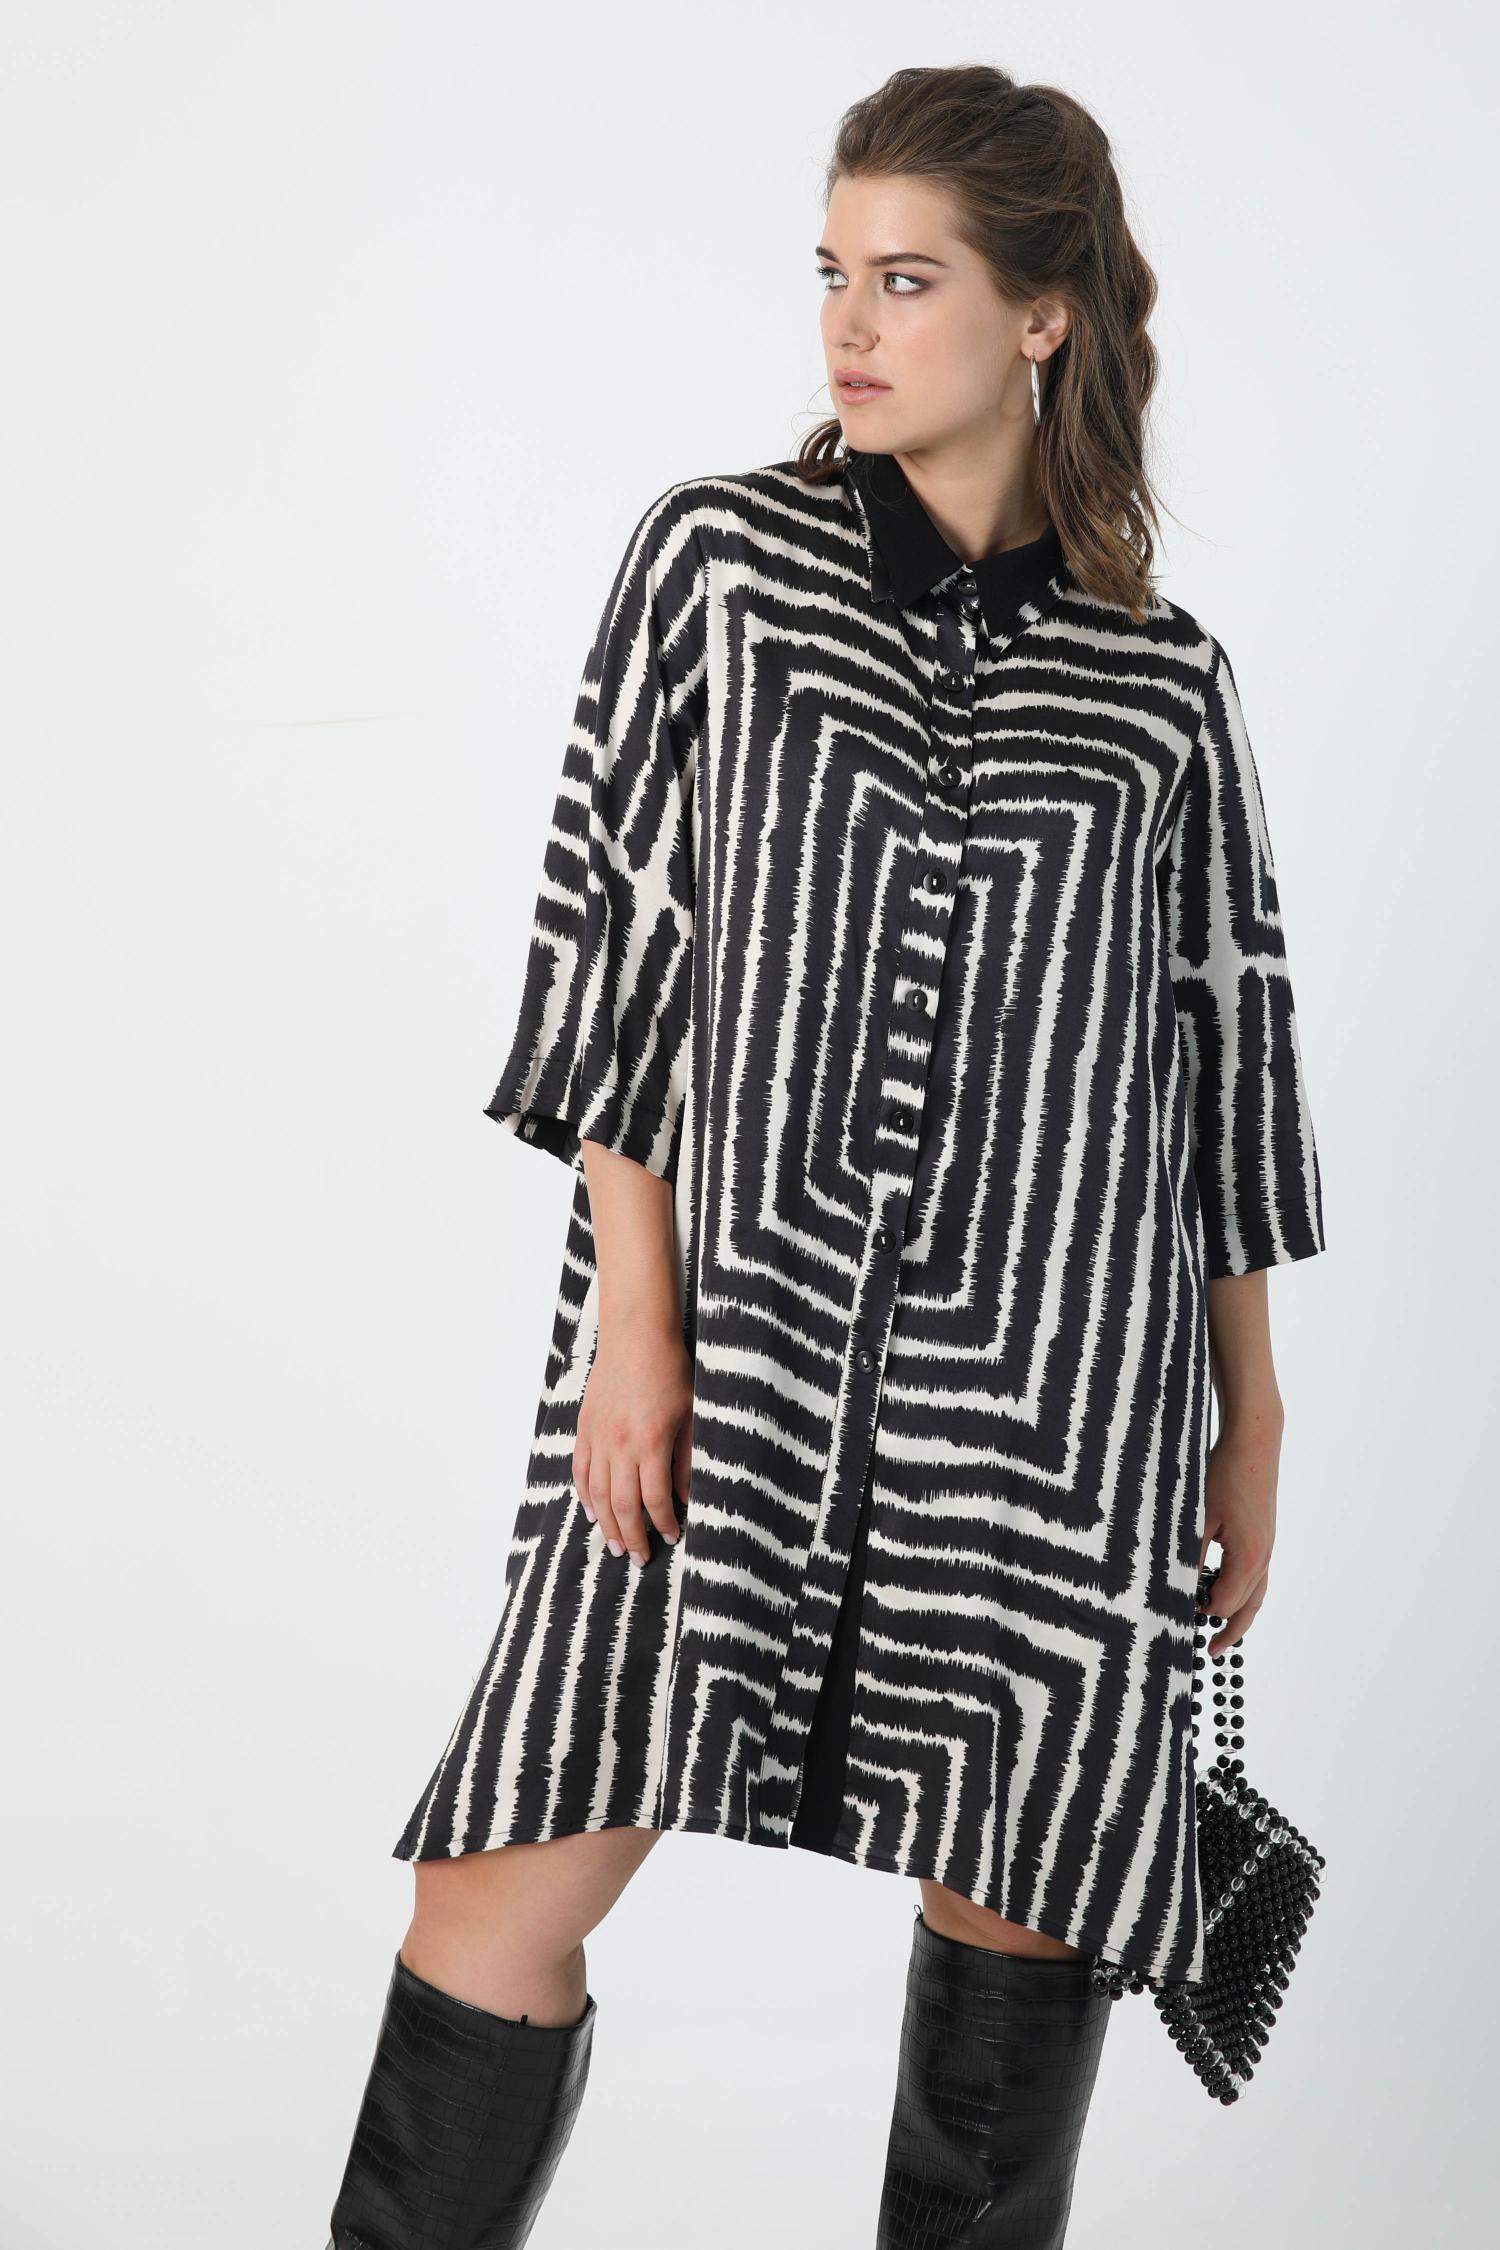 Satin shirt dress with graphic print oeko-tex fabric